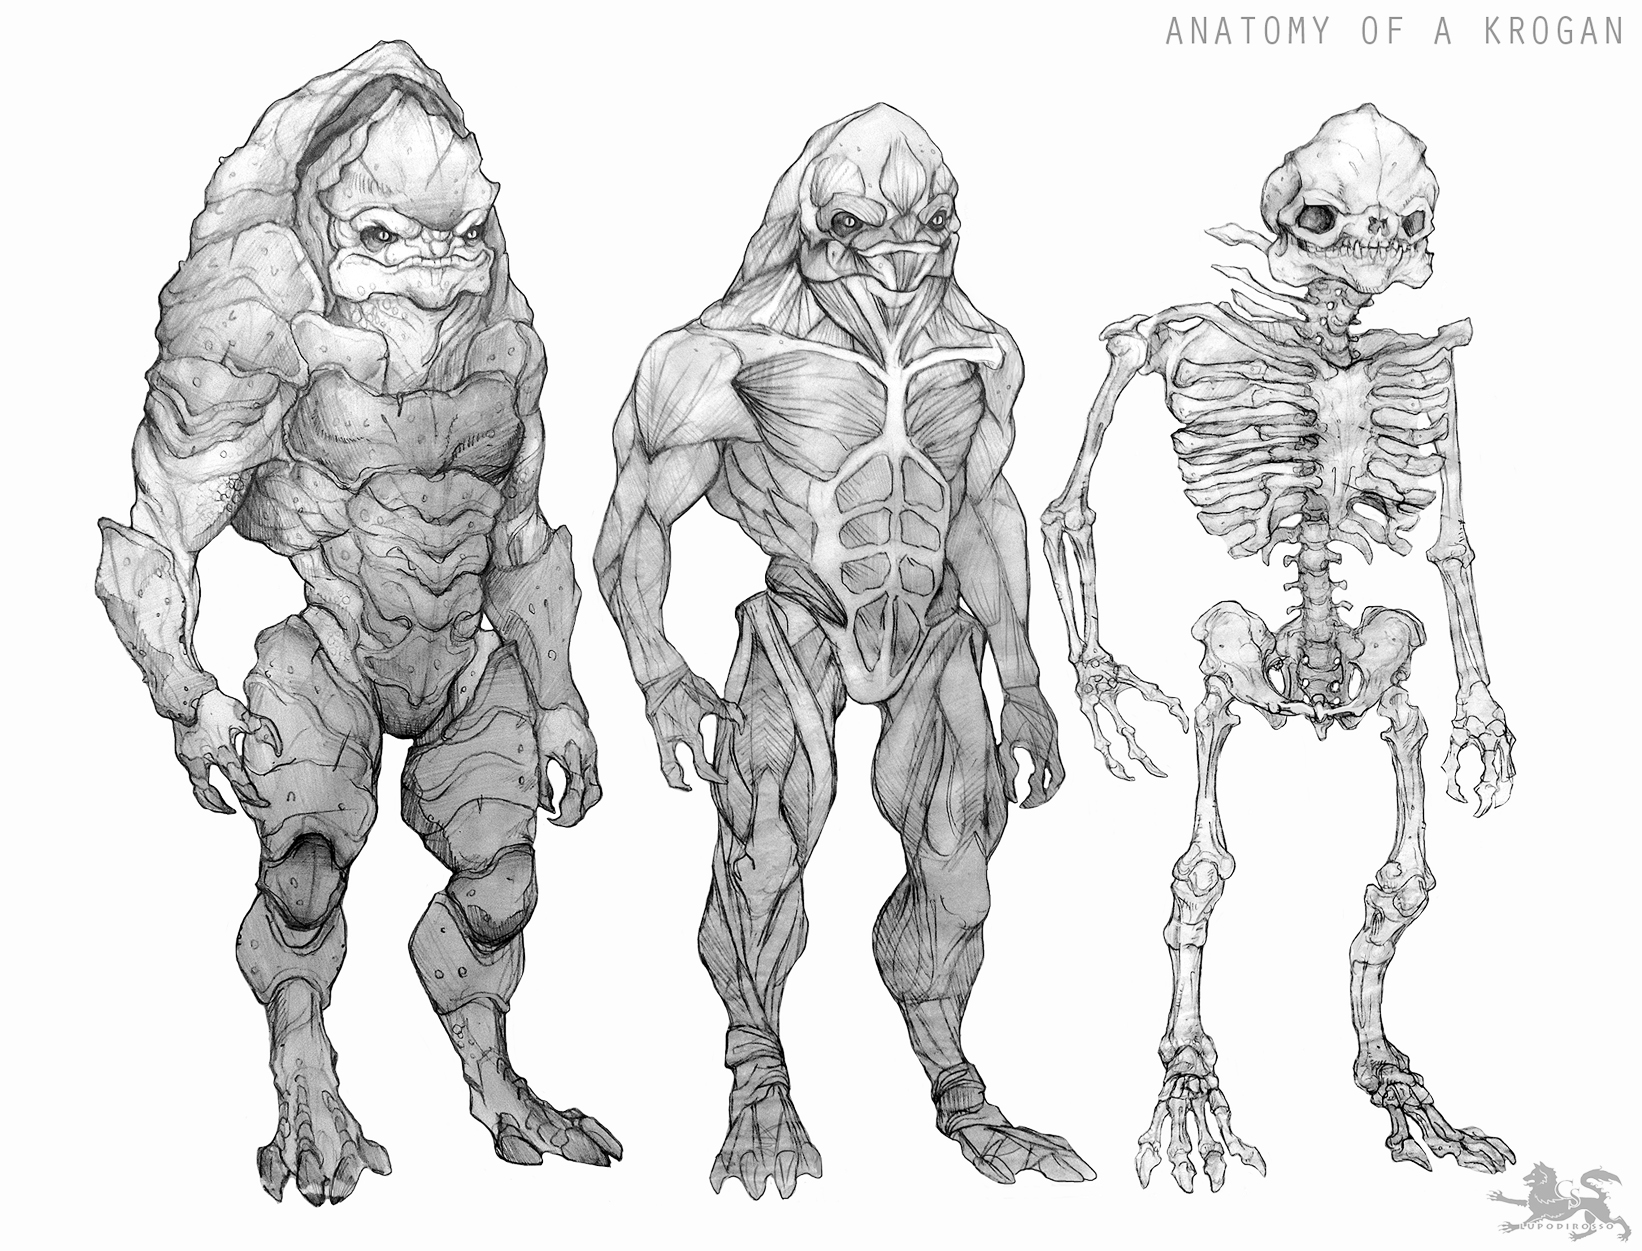 https://orig00.deviantart.net/beef/f/2014/241/4/9/anatomy_of_a_krogan_clean_version_by_lupodirosso-d7x5wy9.jpg